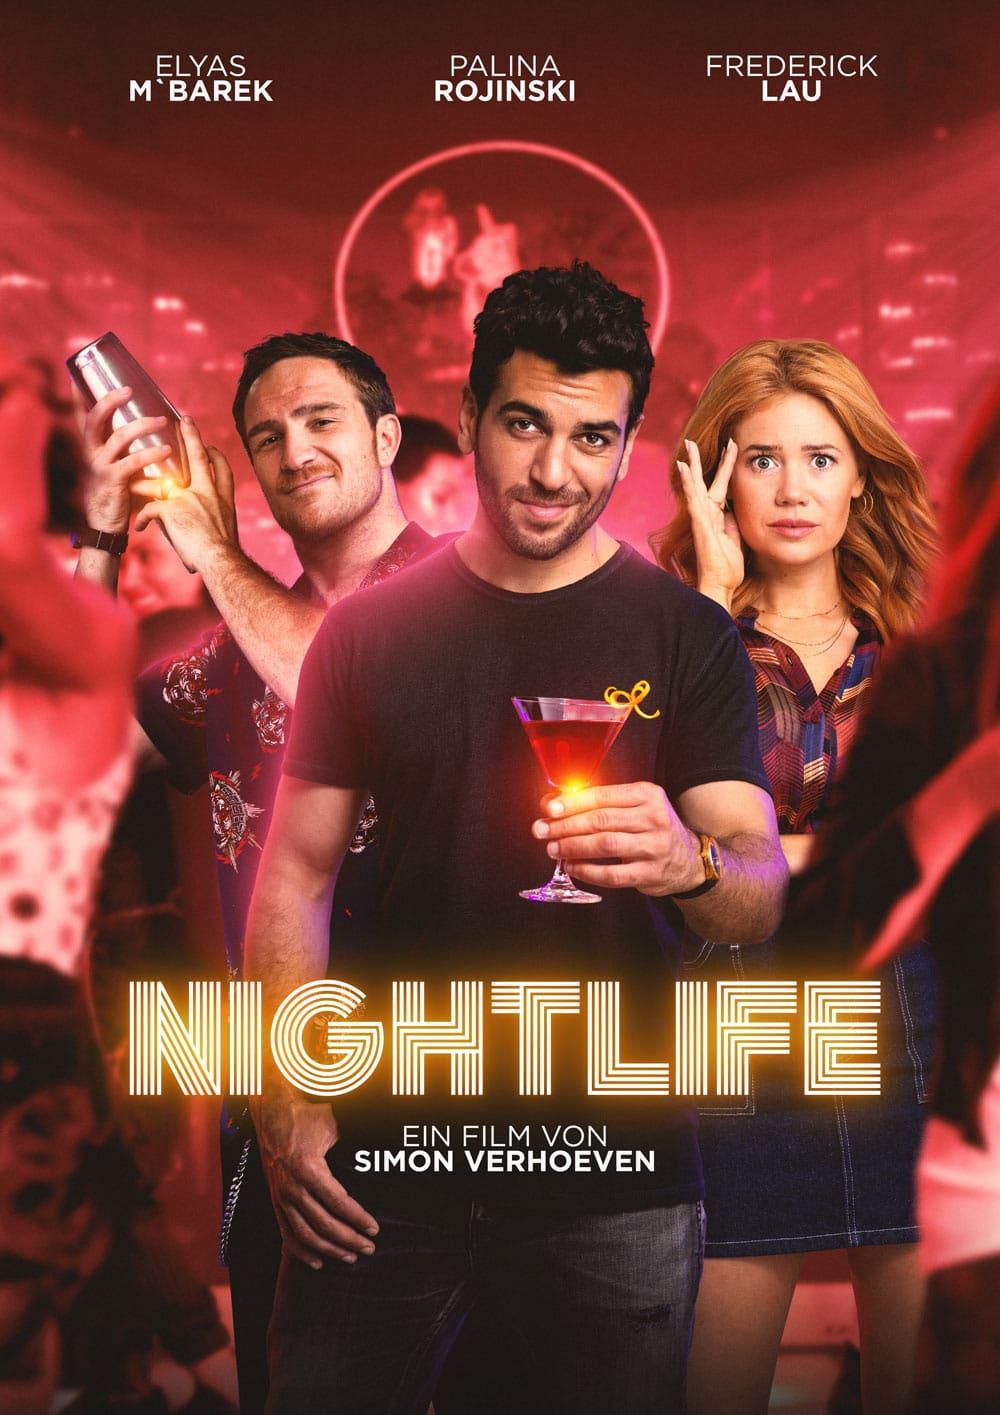 Nightlife Film - Alternative Artwork - Key Visual - 5